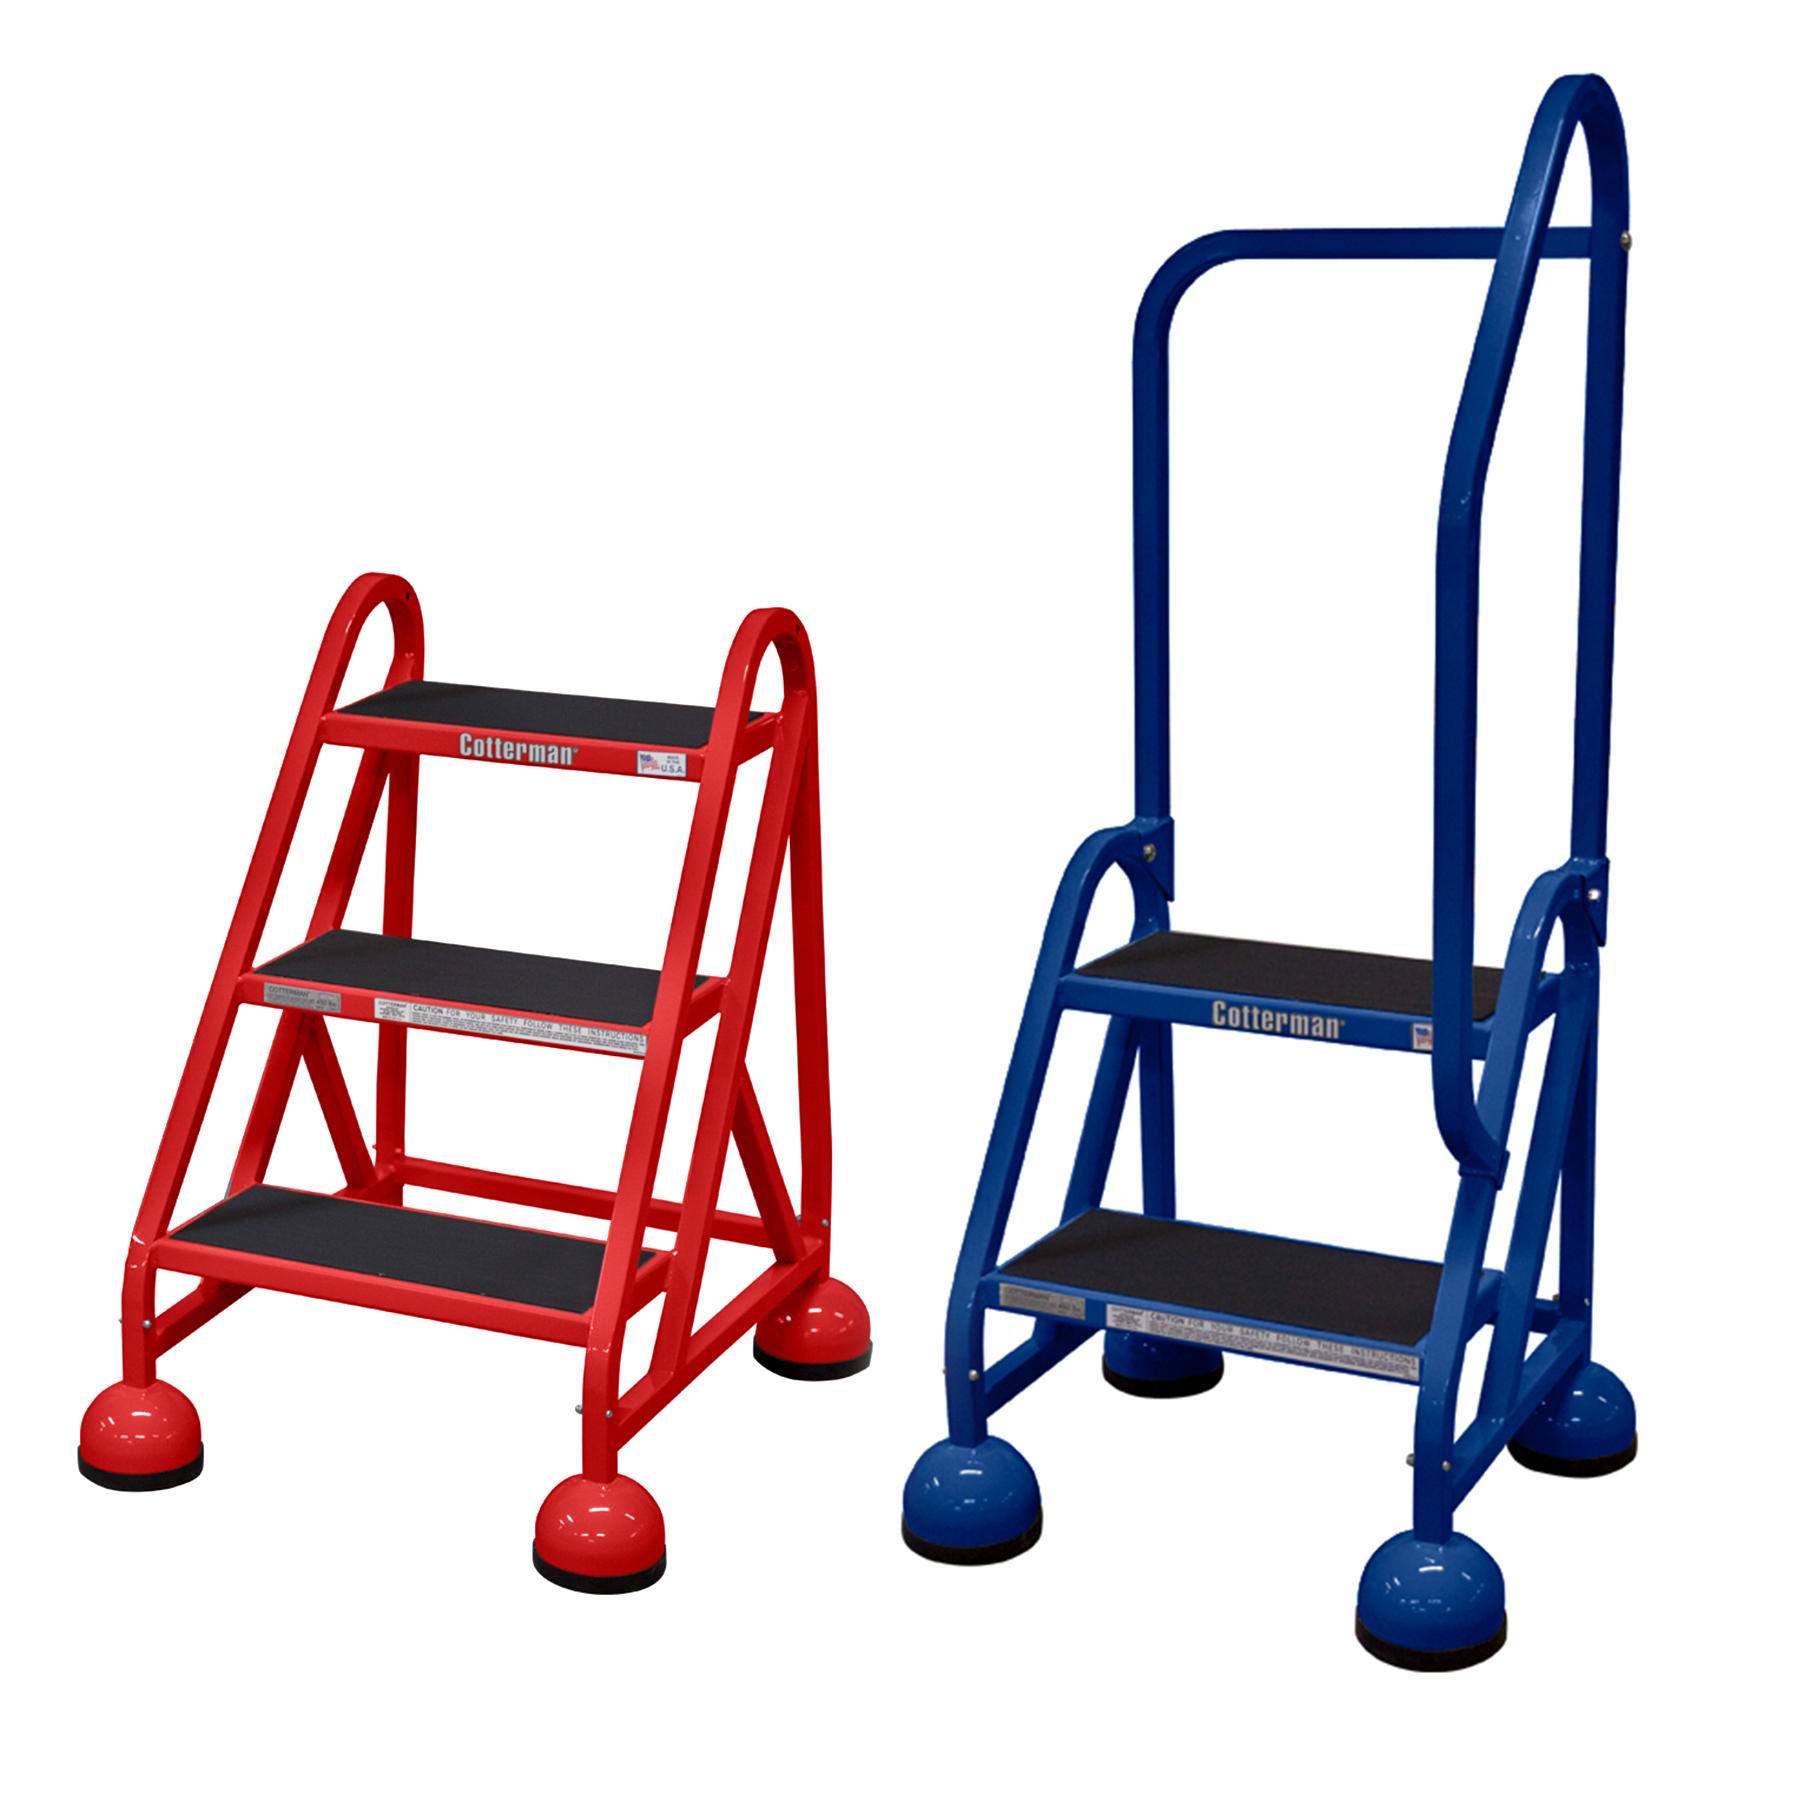 Tremendous Office Ladder Ring Set Pdpeps Interior Chair Design Pdpepsorg